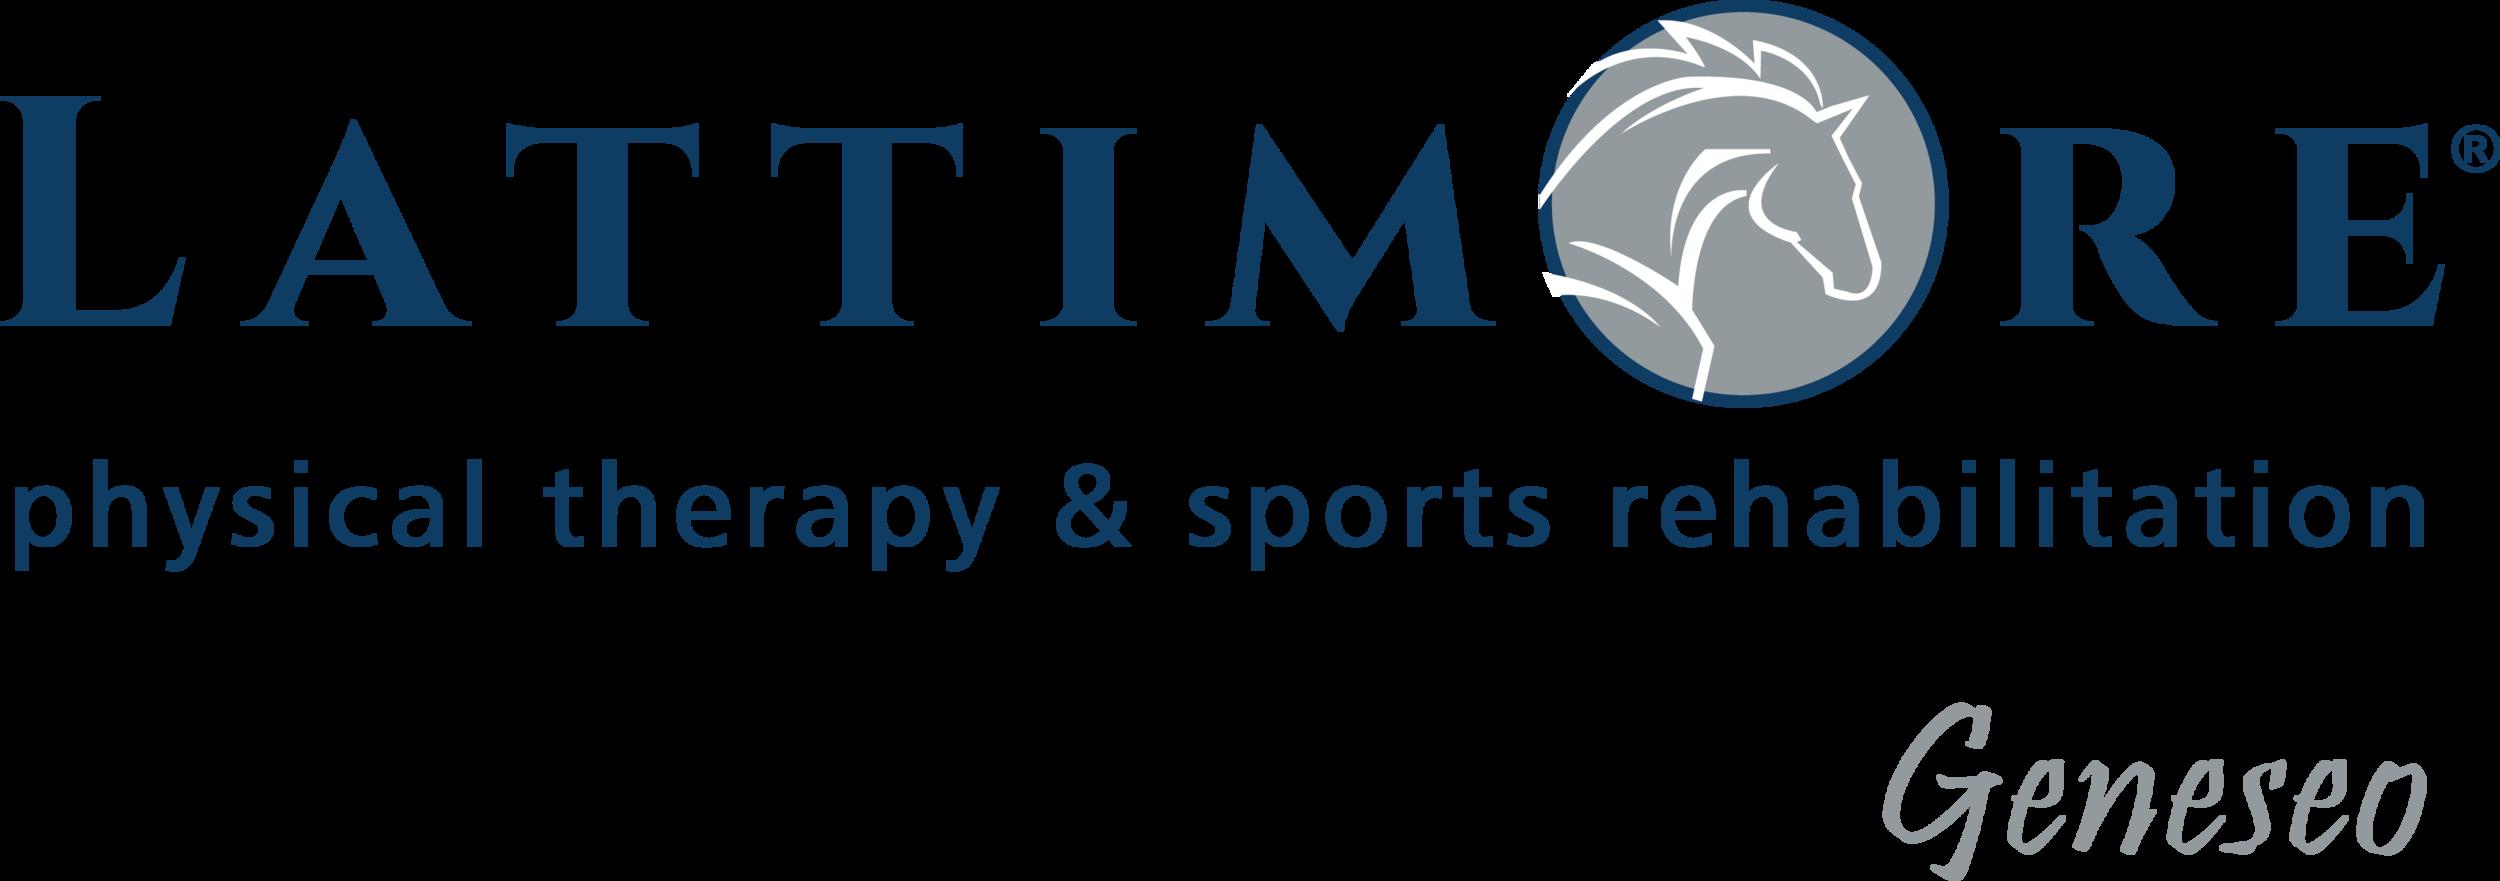 2019-05_Lattimore-Logo-Geneseo.png